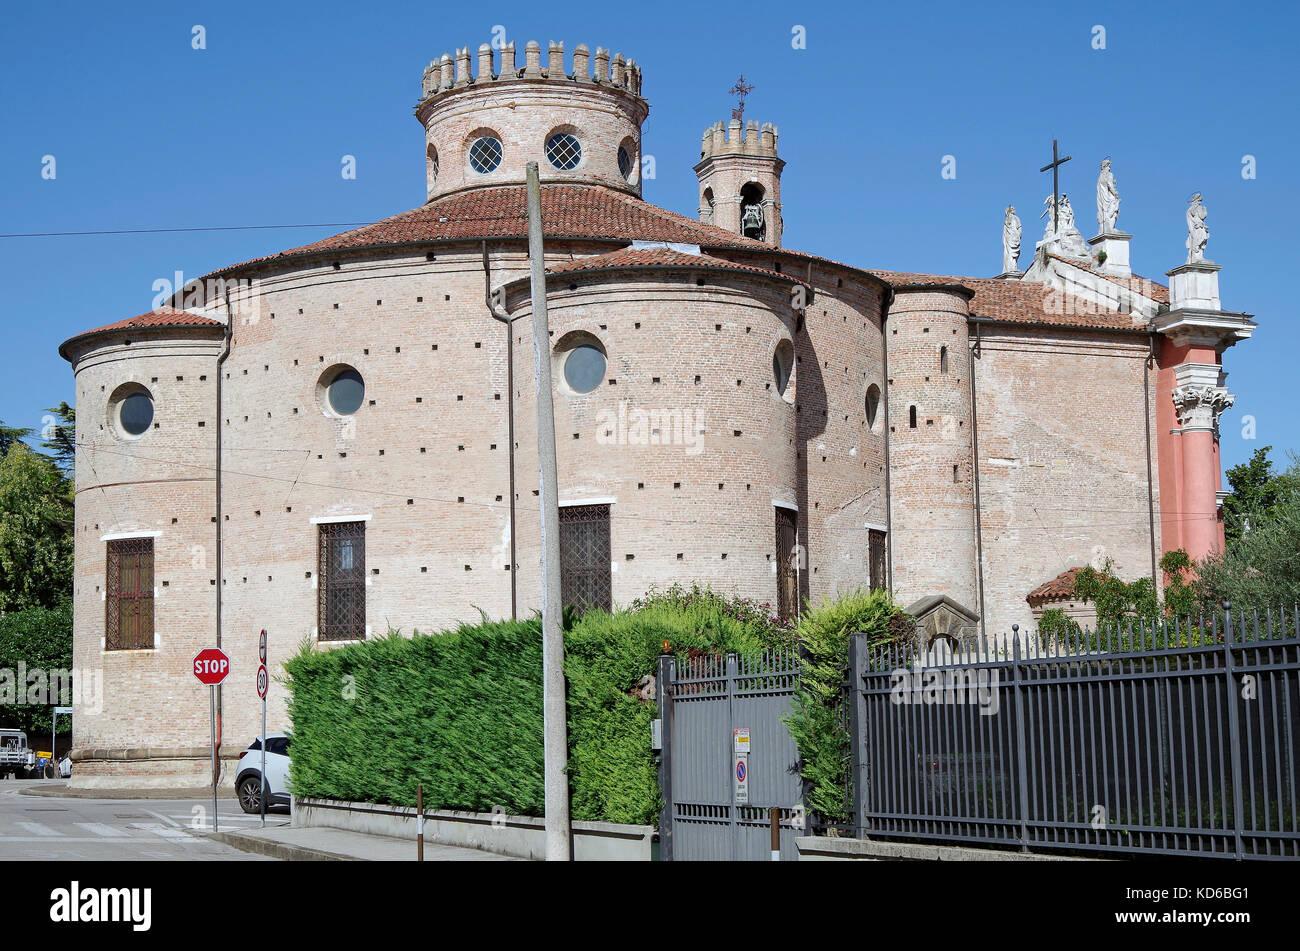 Chiesa dell Torresino, a parish church in the city of Padua - Stock Image